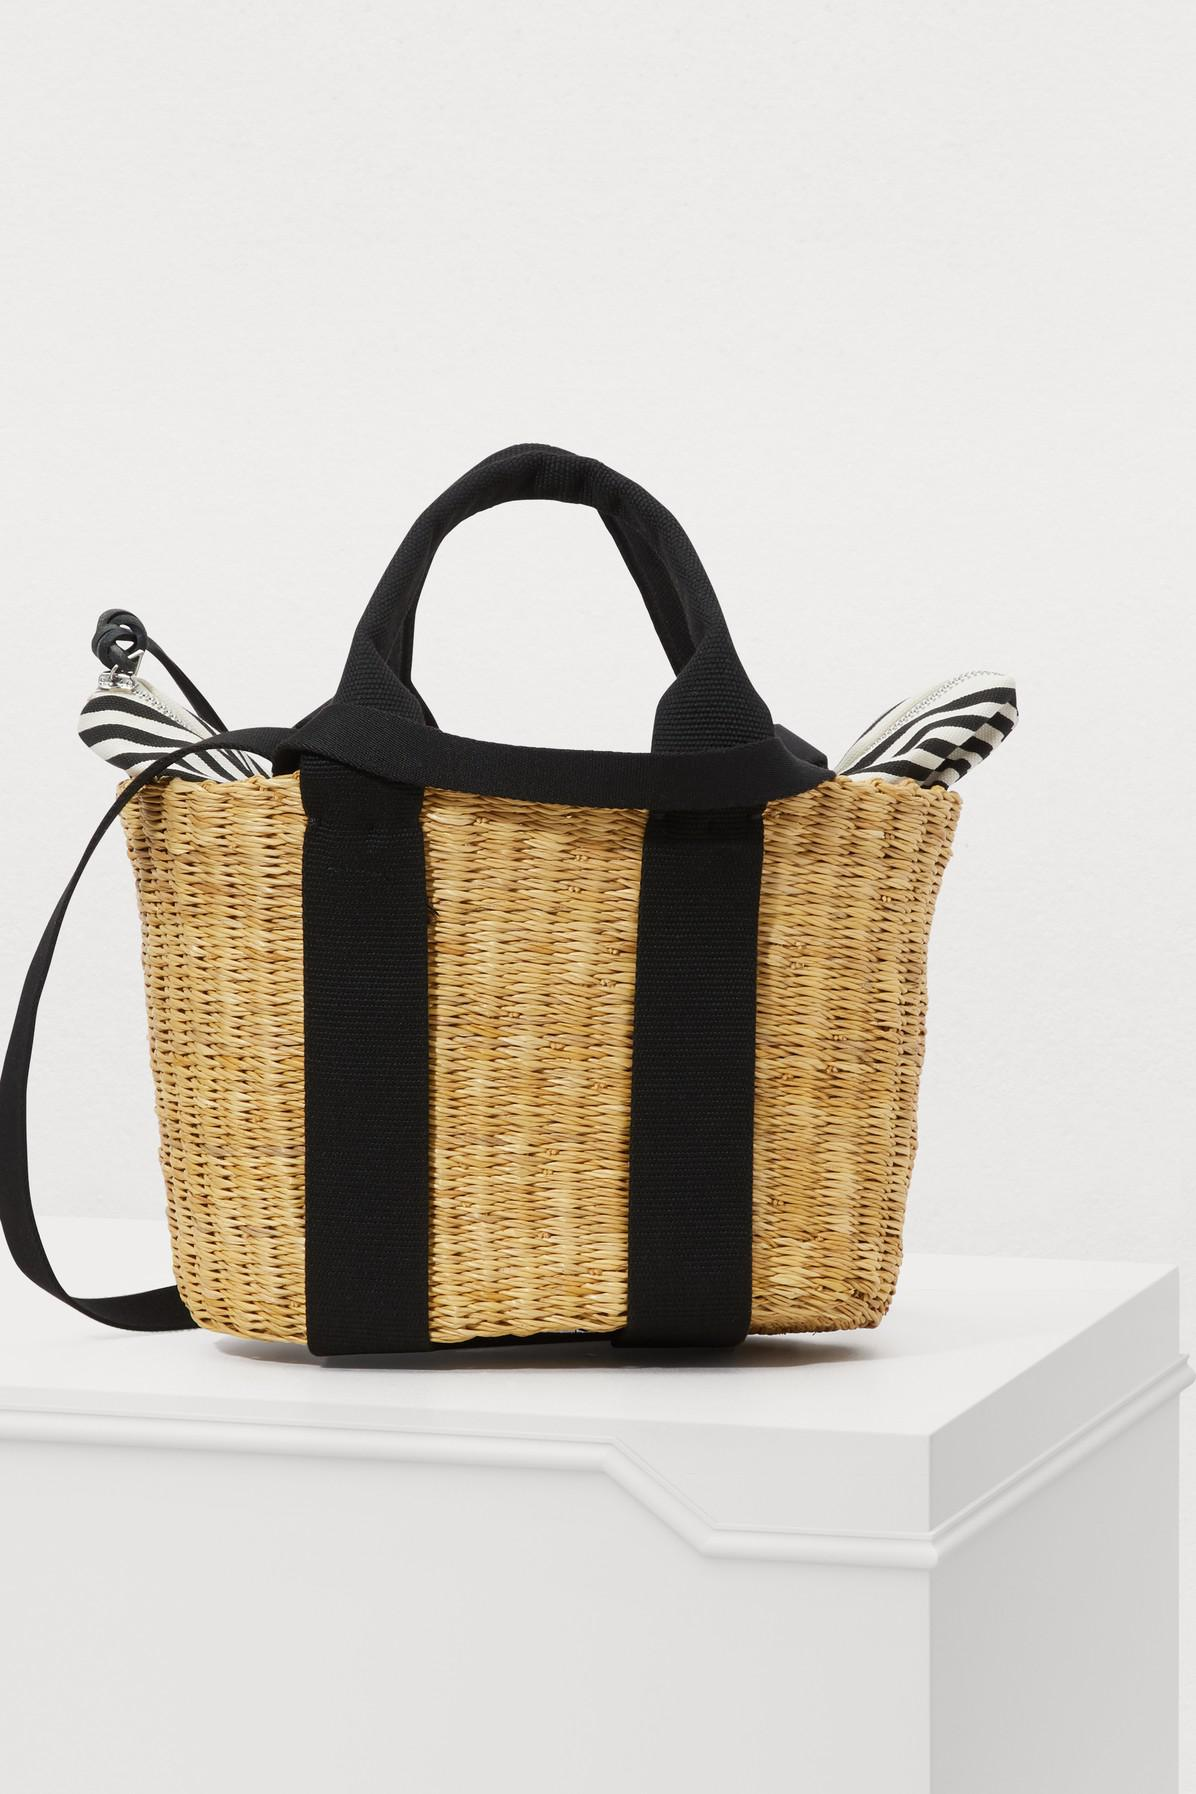 b3749de1a150 Lyst - Muuñ Tote Bag With Pouch in Black